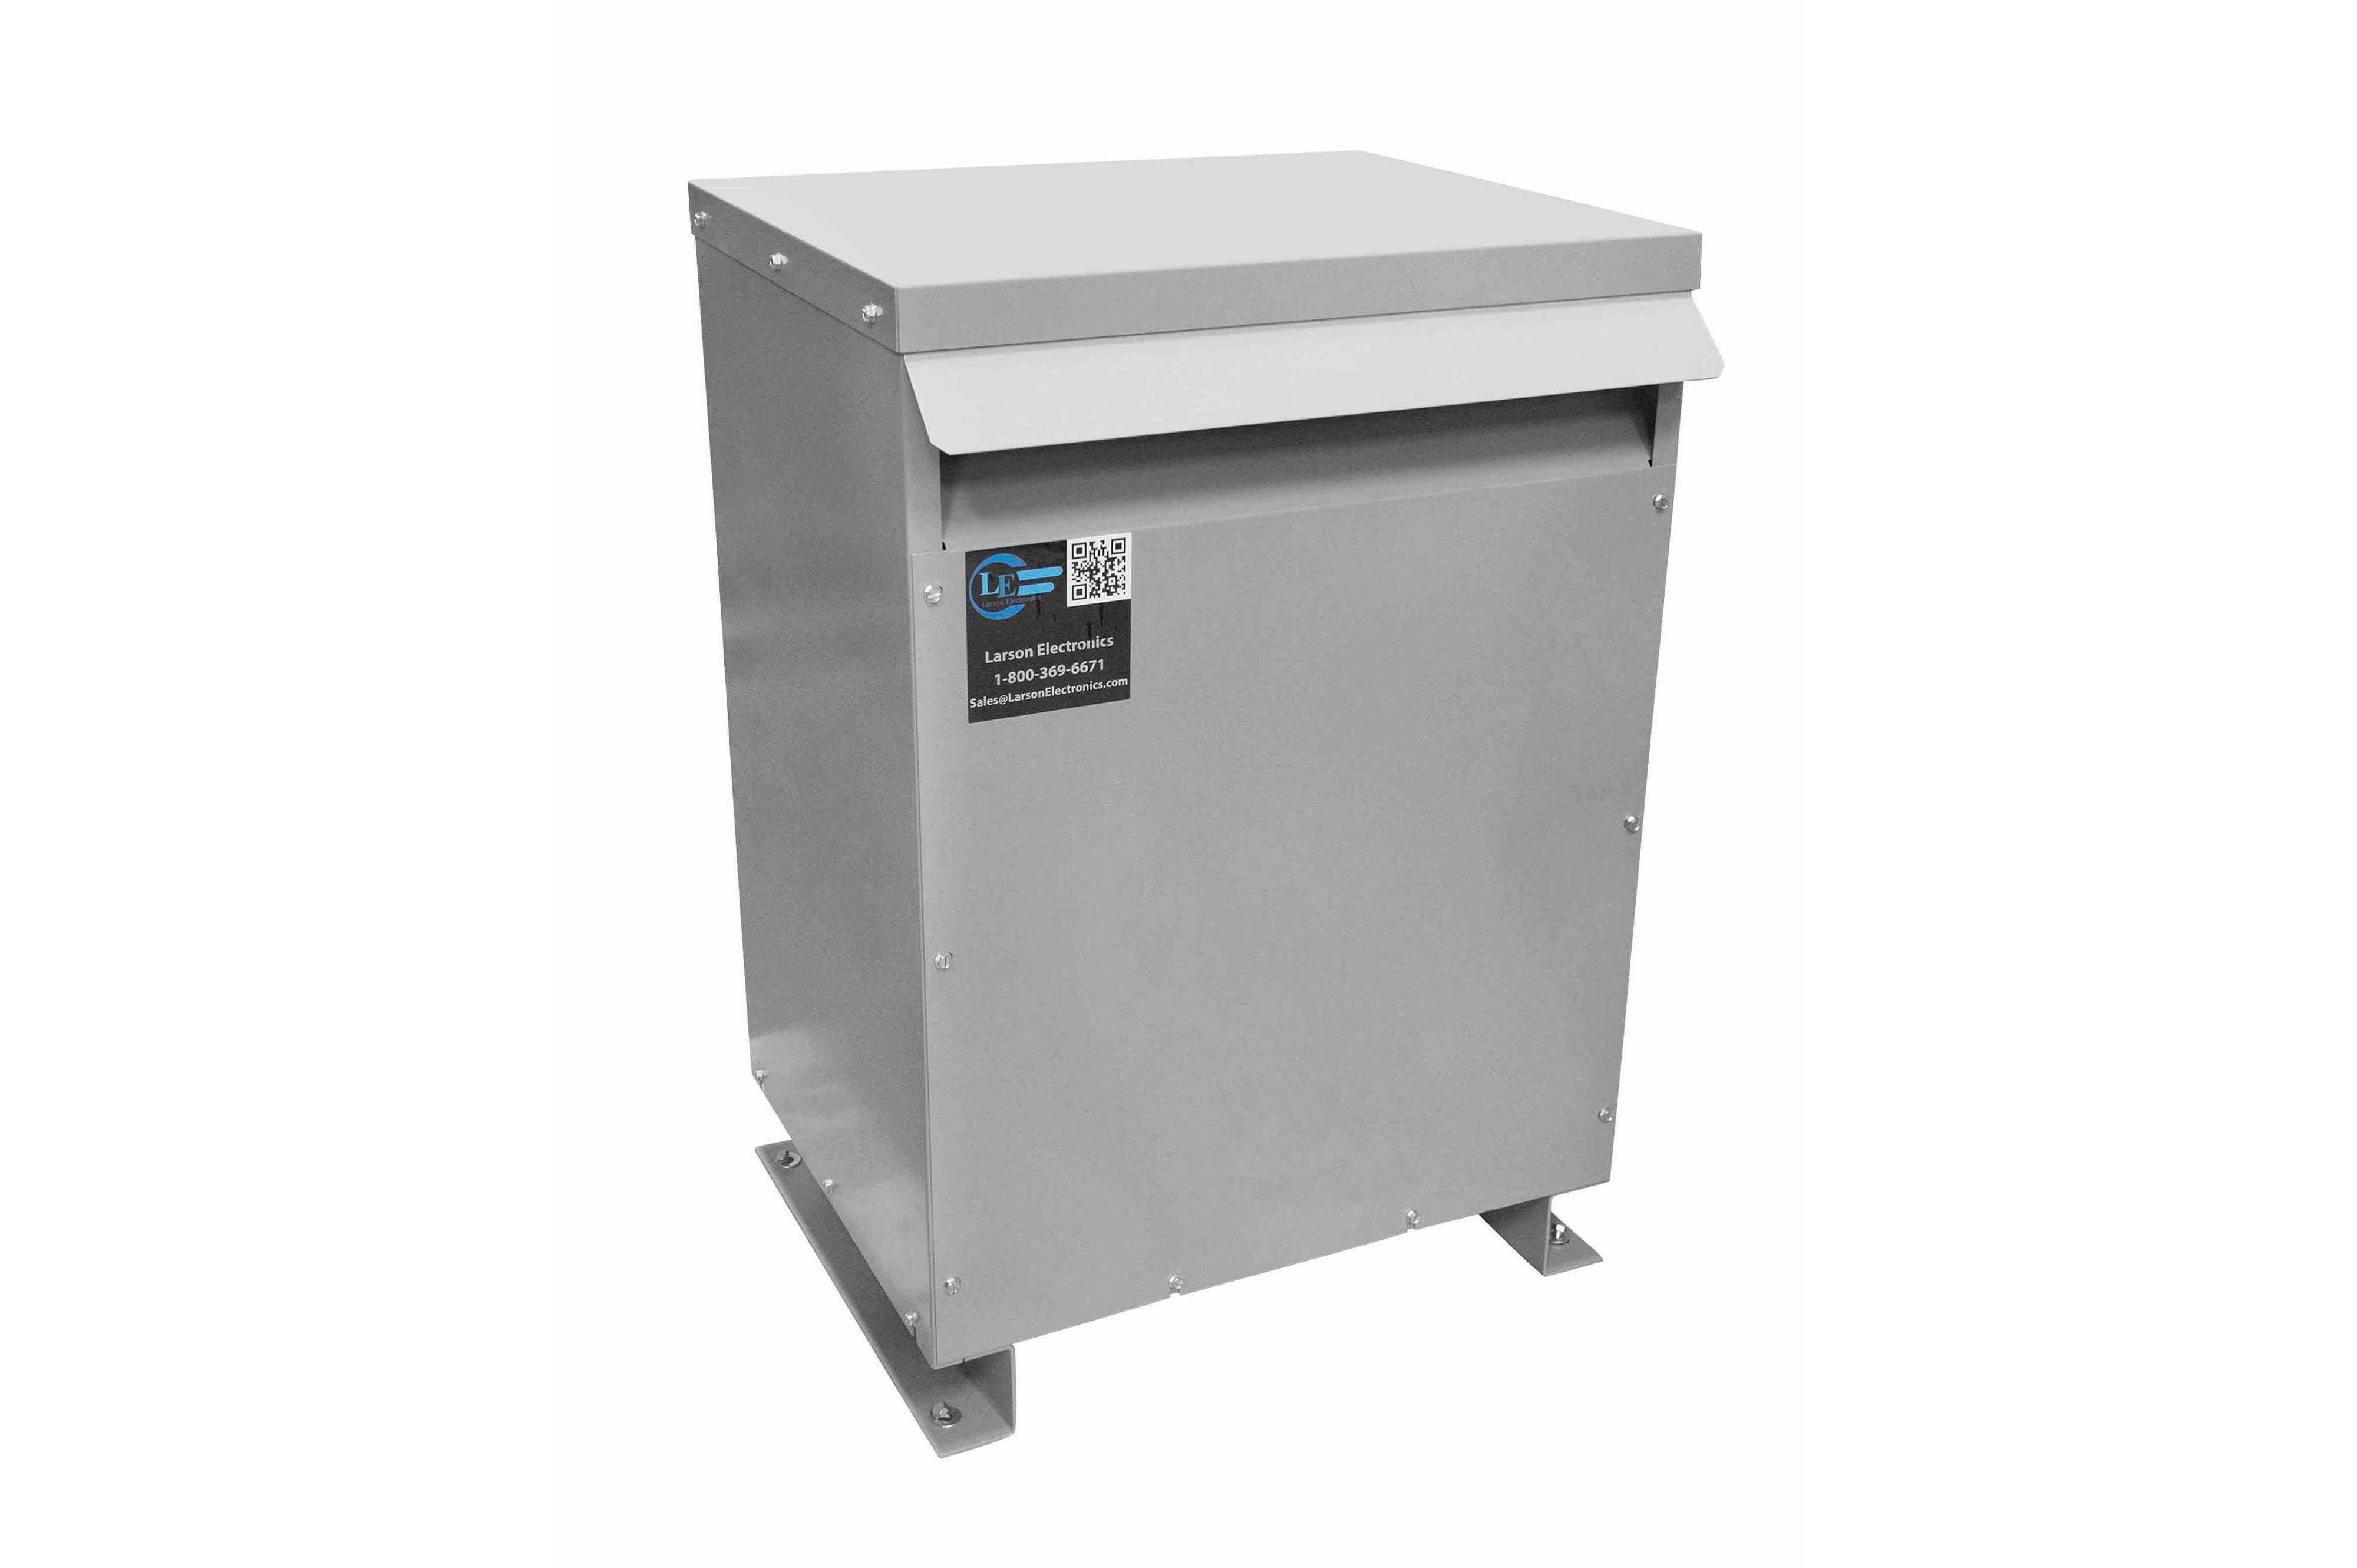 137.5 kVA 3PH Isolation Transformer, 460V Wye Primary, 575Y/332 Wye-N Secondary, N3R, Ventilated, 60 Hz